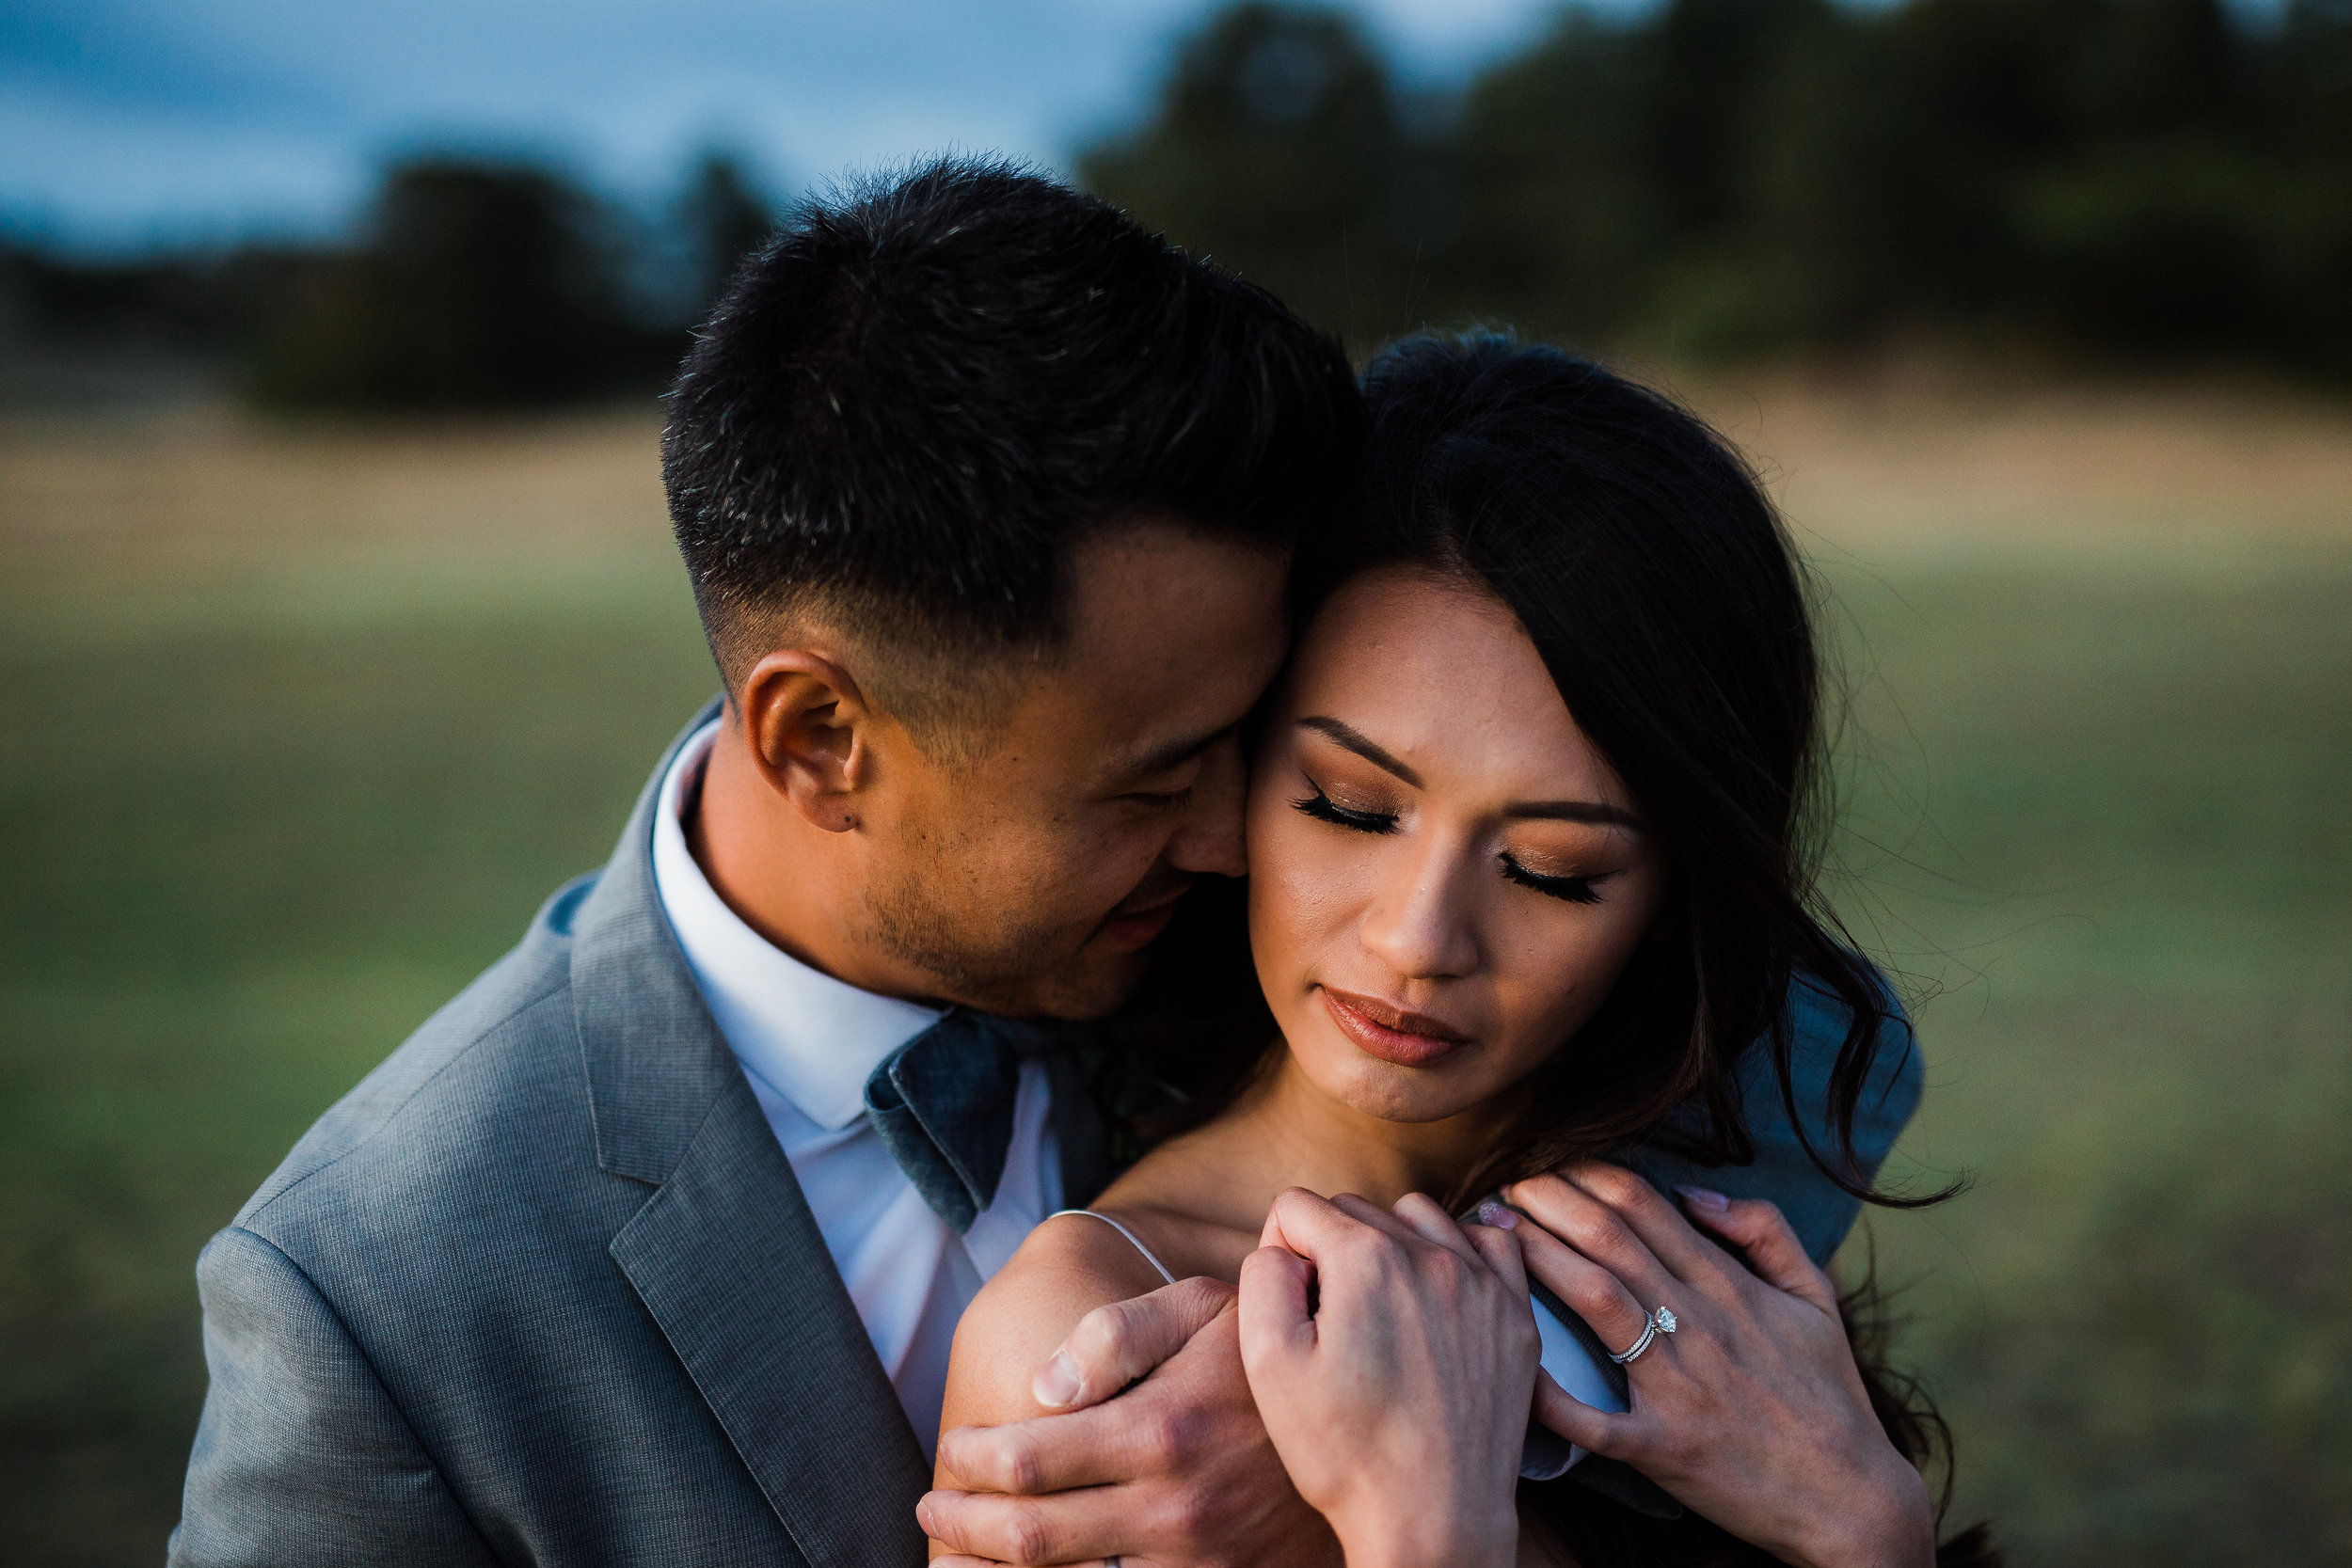 Intimate wedding photographers in colorado springs